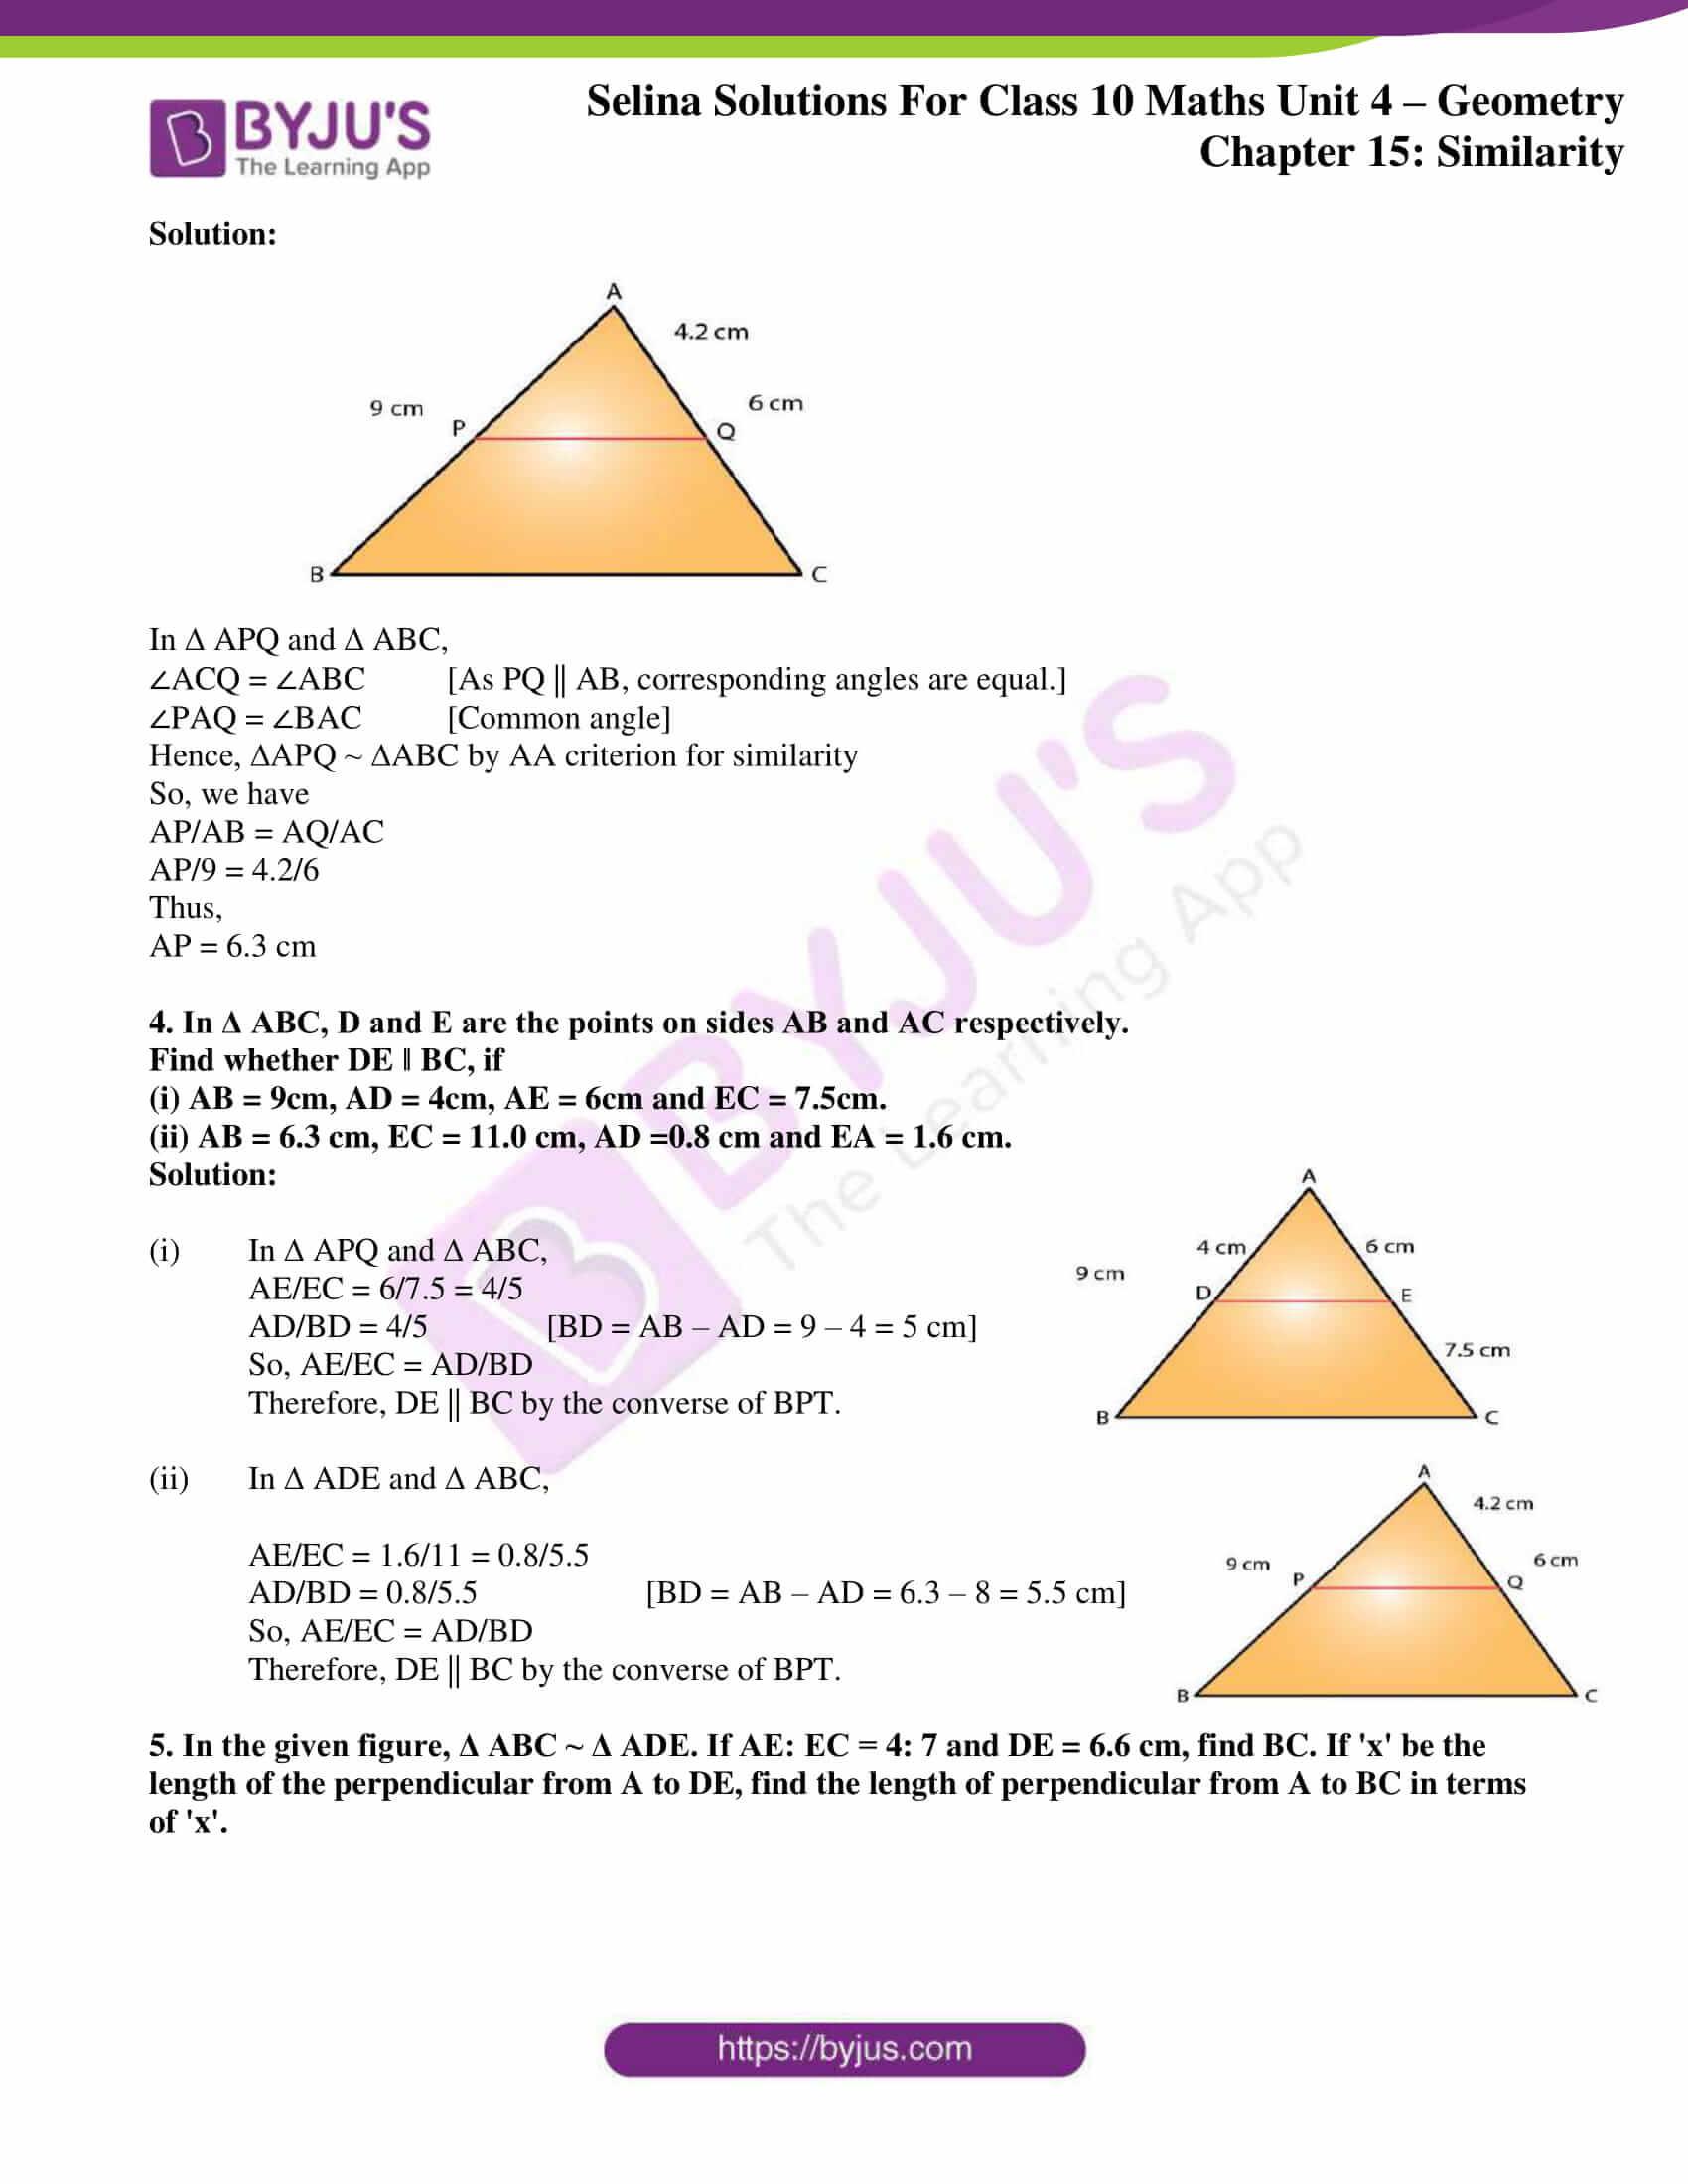 selina-sol-maths-class-10-ch-15-ex-b-3